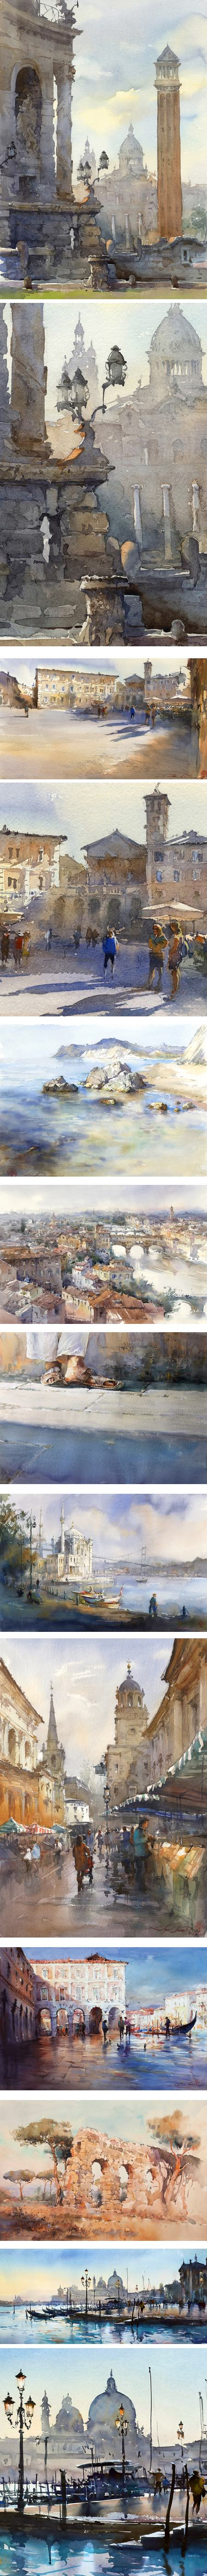 Igor Sava, watercolor cityscape Italy